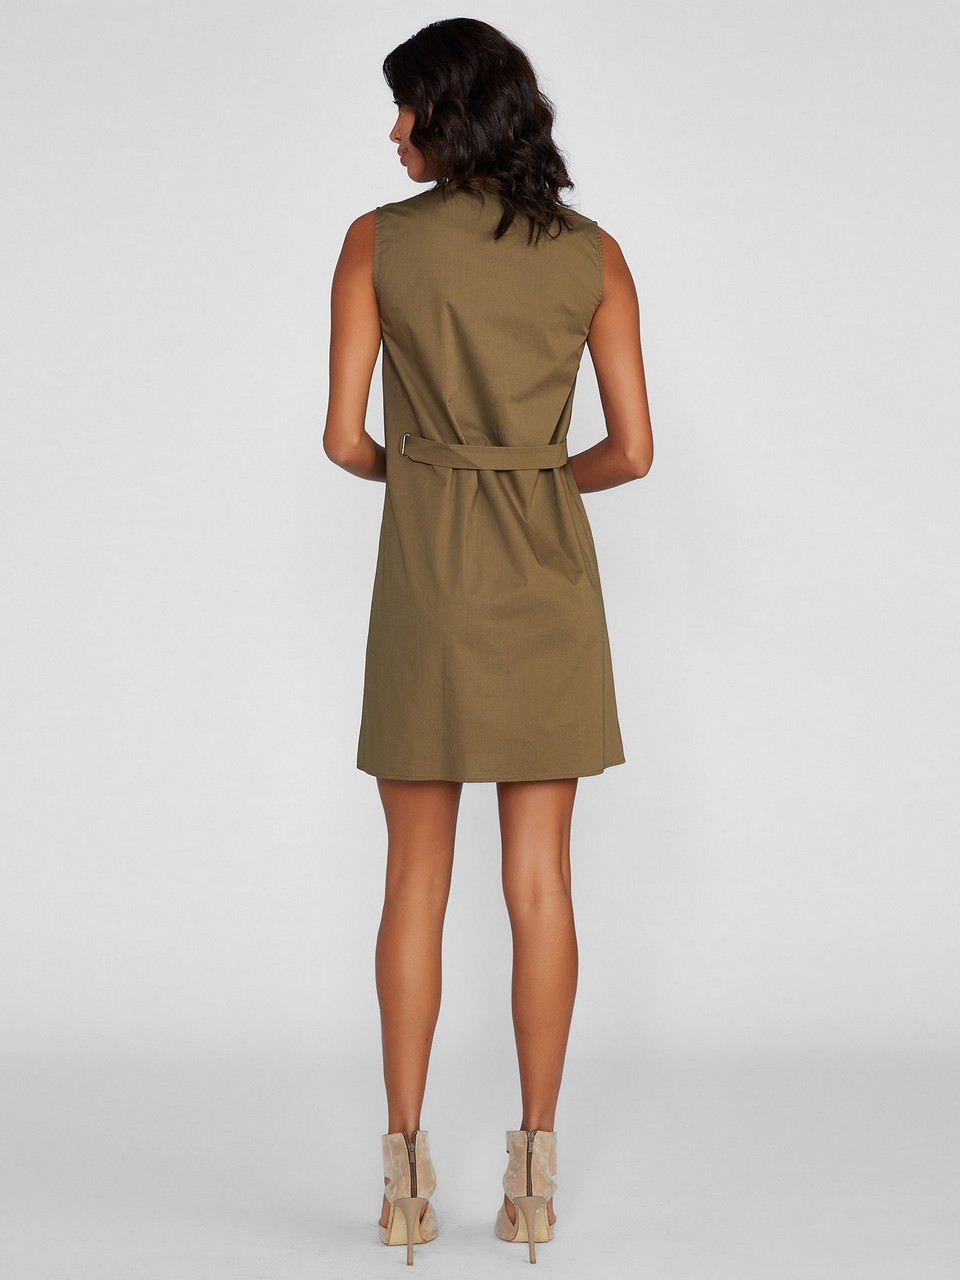 Sıfır Kol Rahat Kesim Elbise